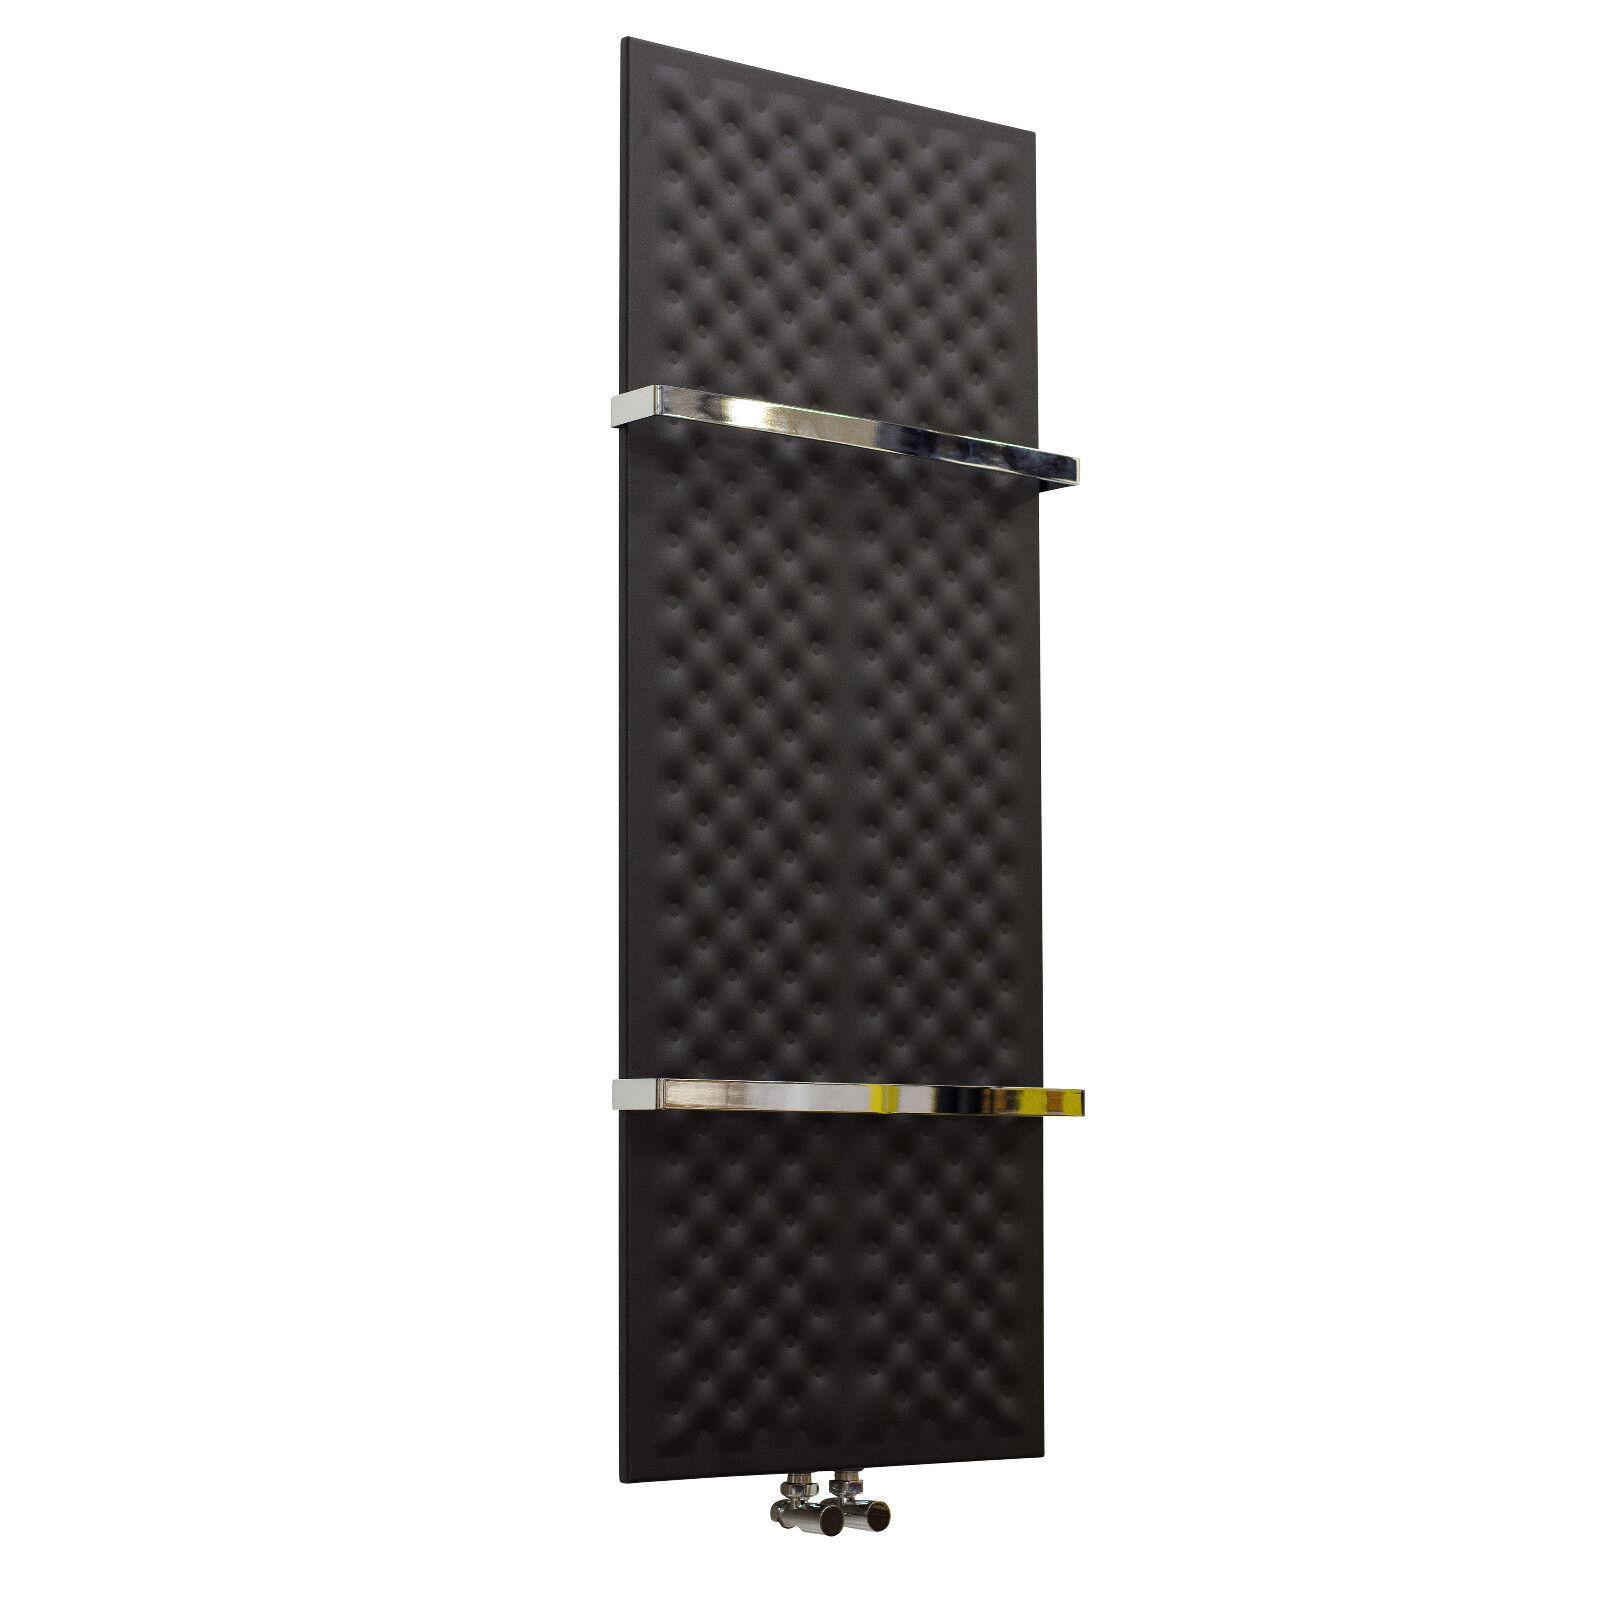 450mm wide Designer Heated Heated Heated Towel Rail Radiator 1200 1600mm high Luxury Bathroom 8bc3dd